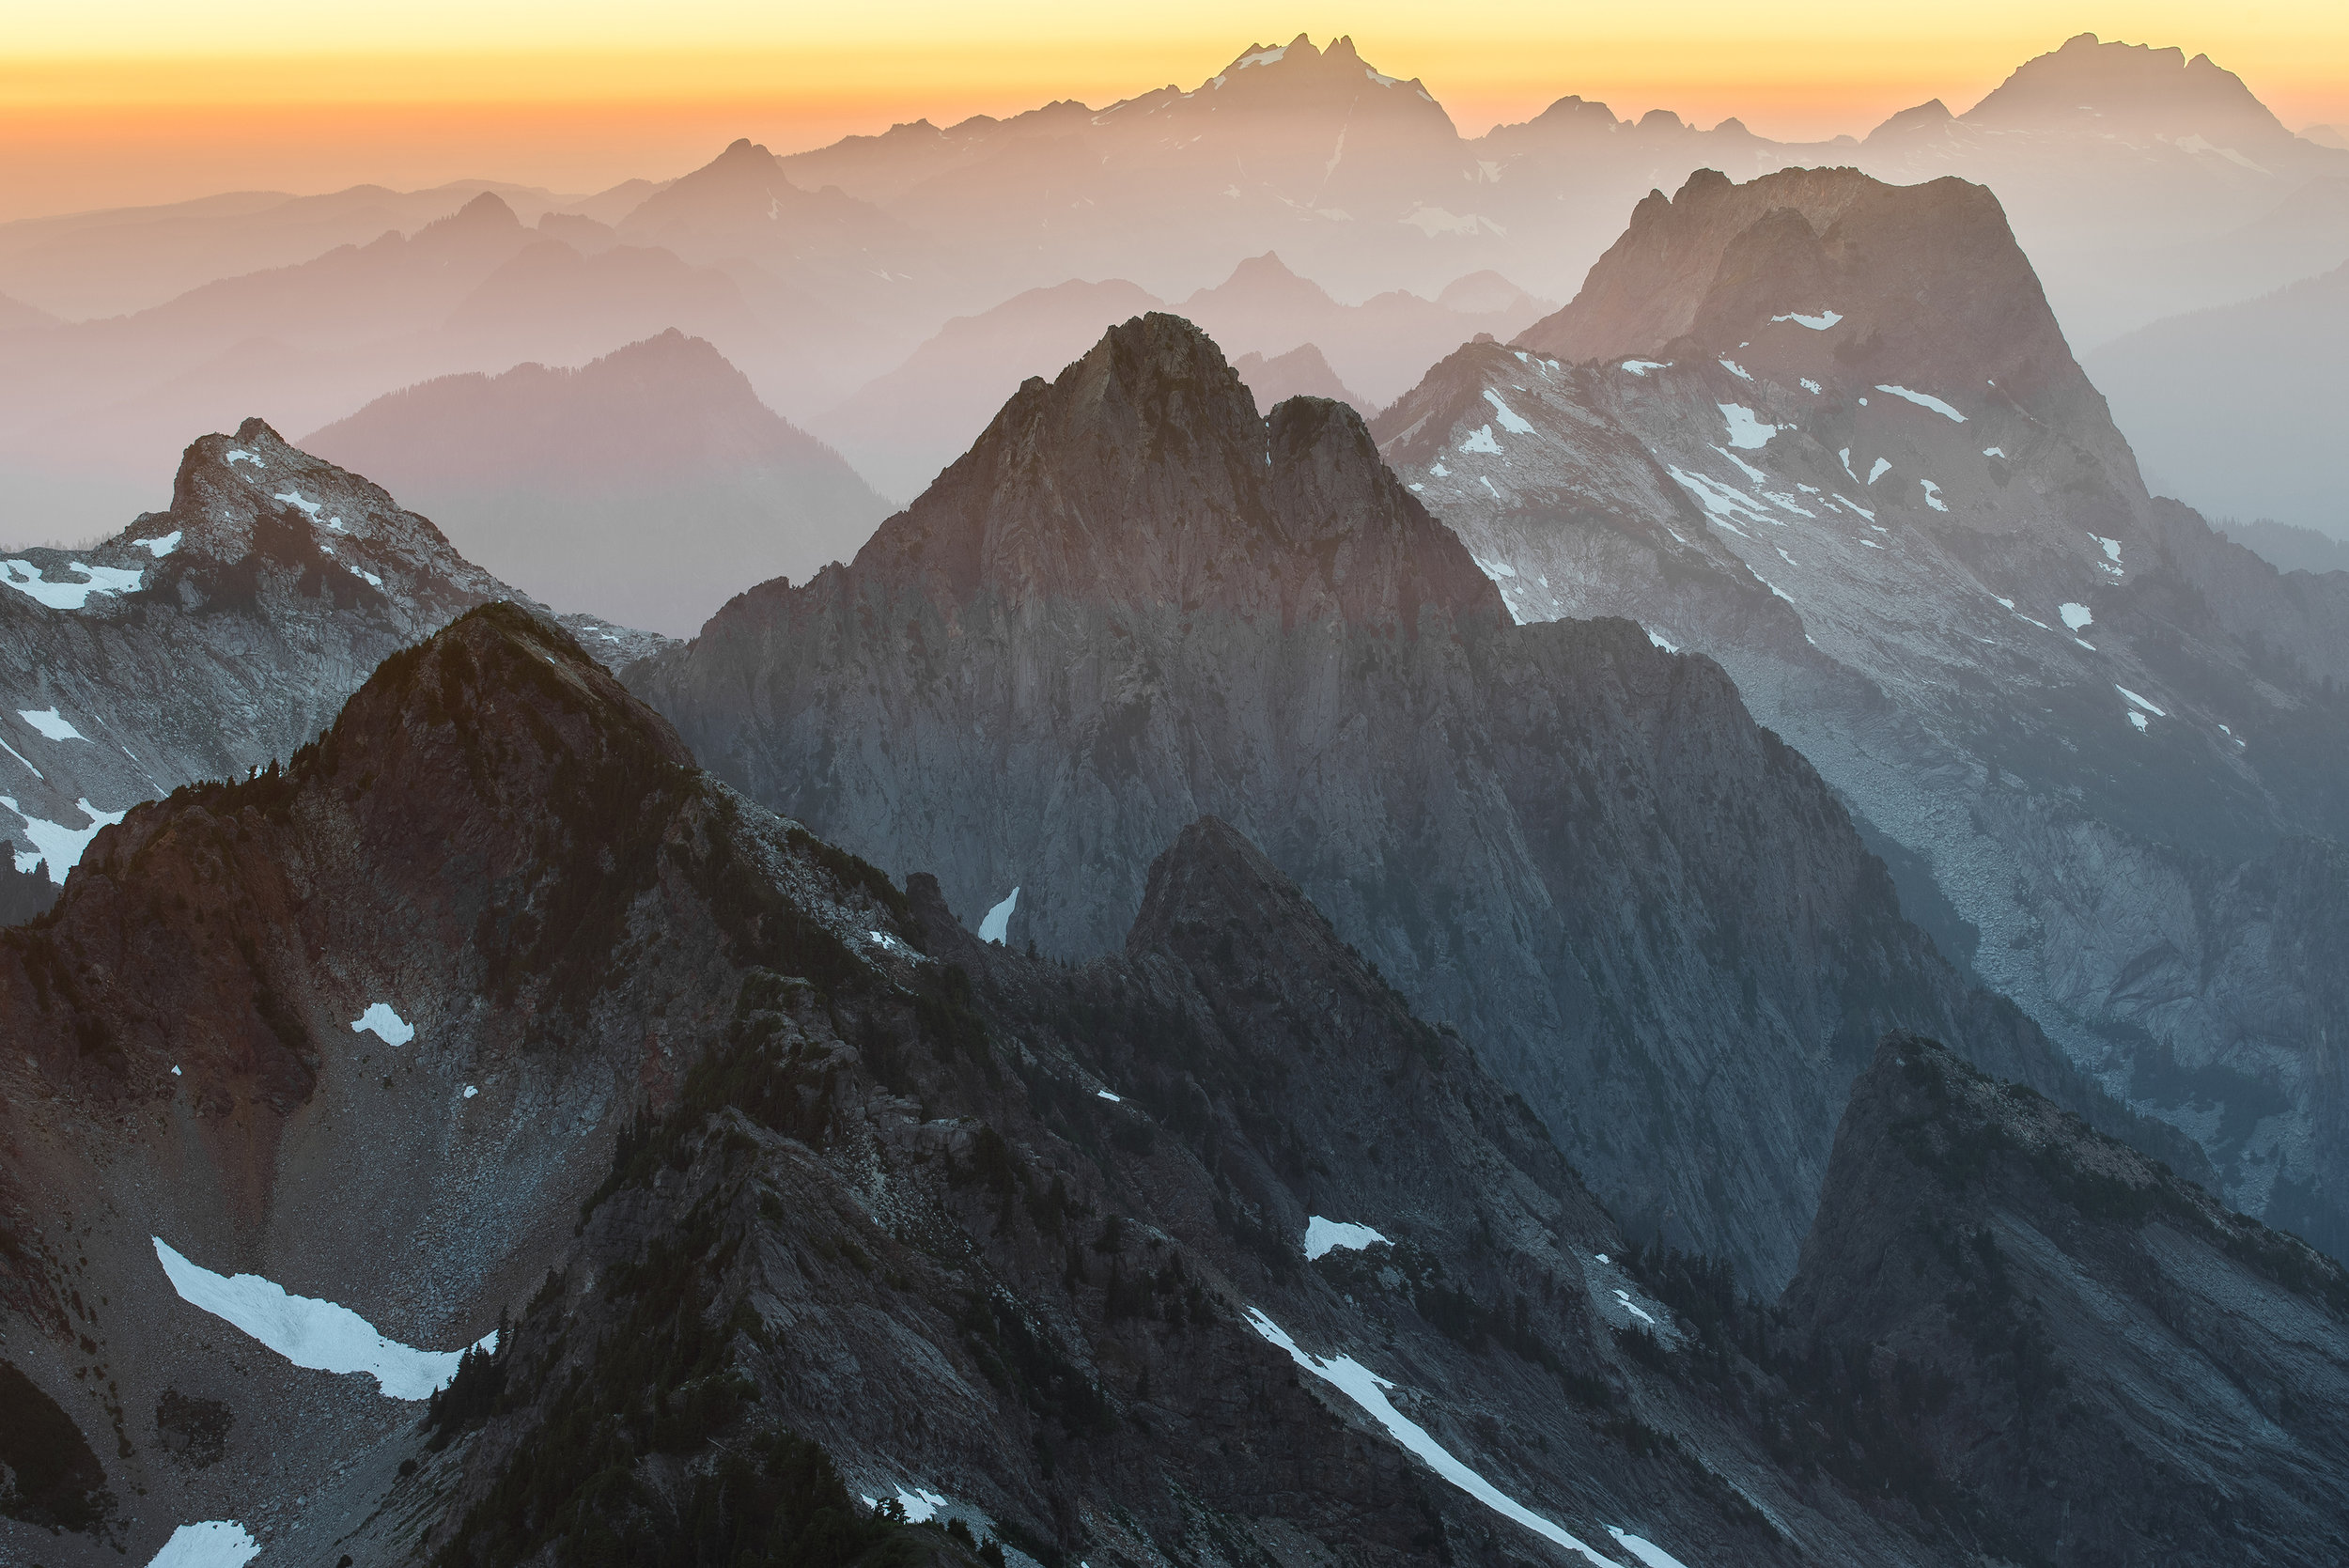 Summit view at sunset proper.